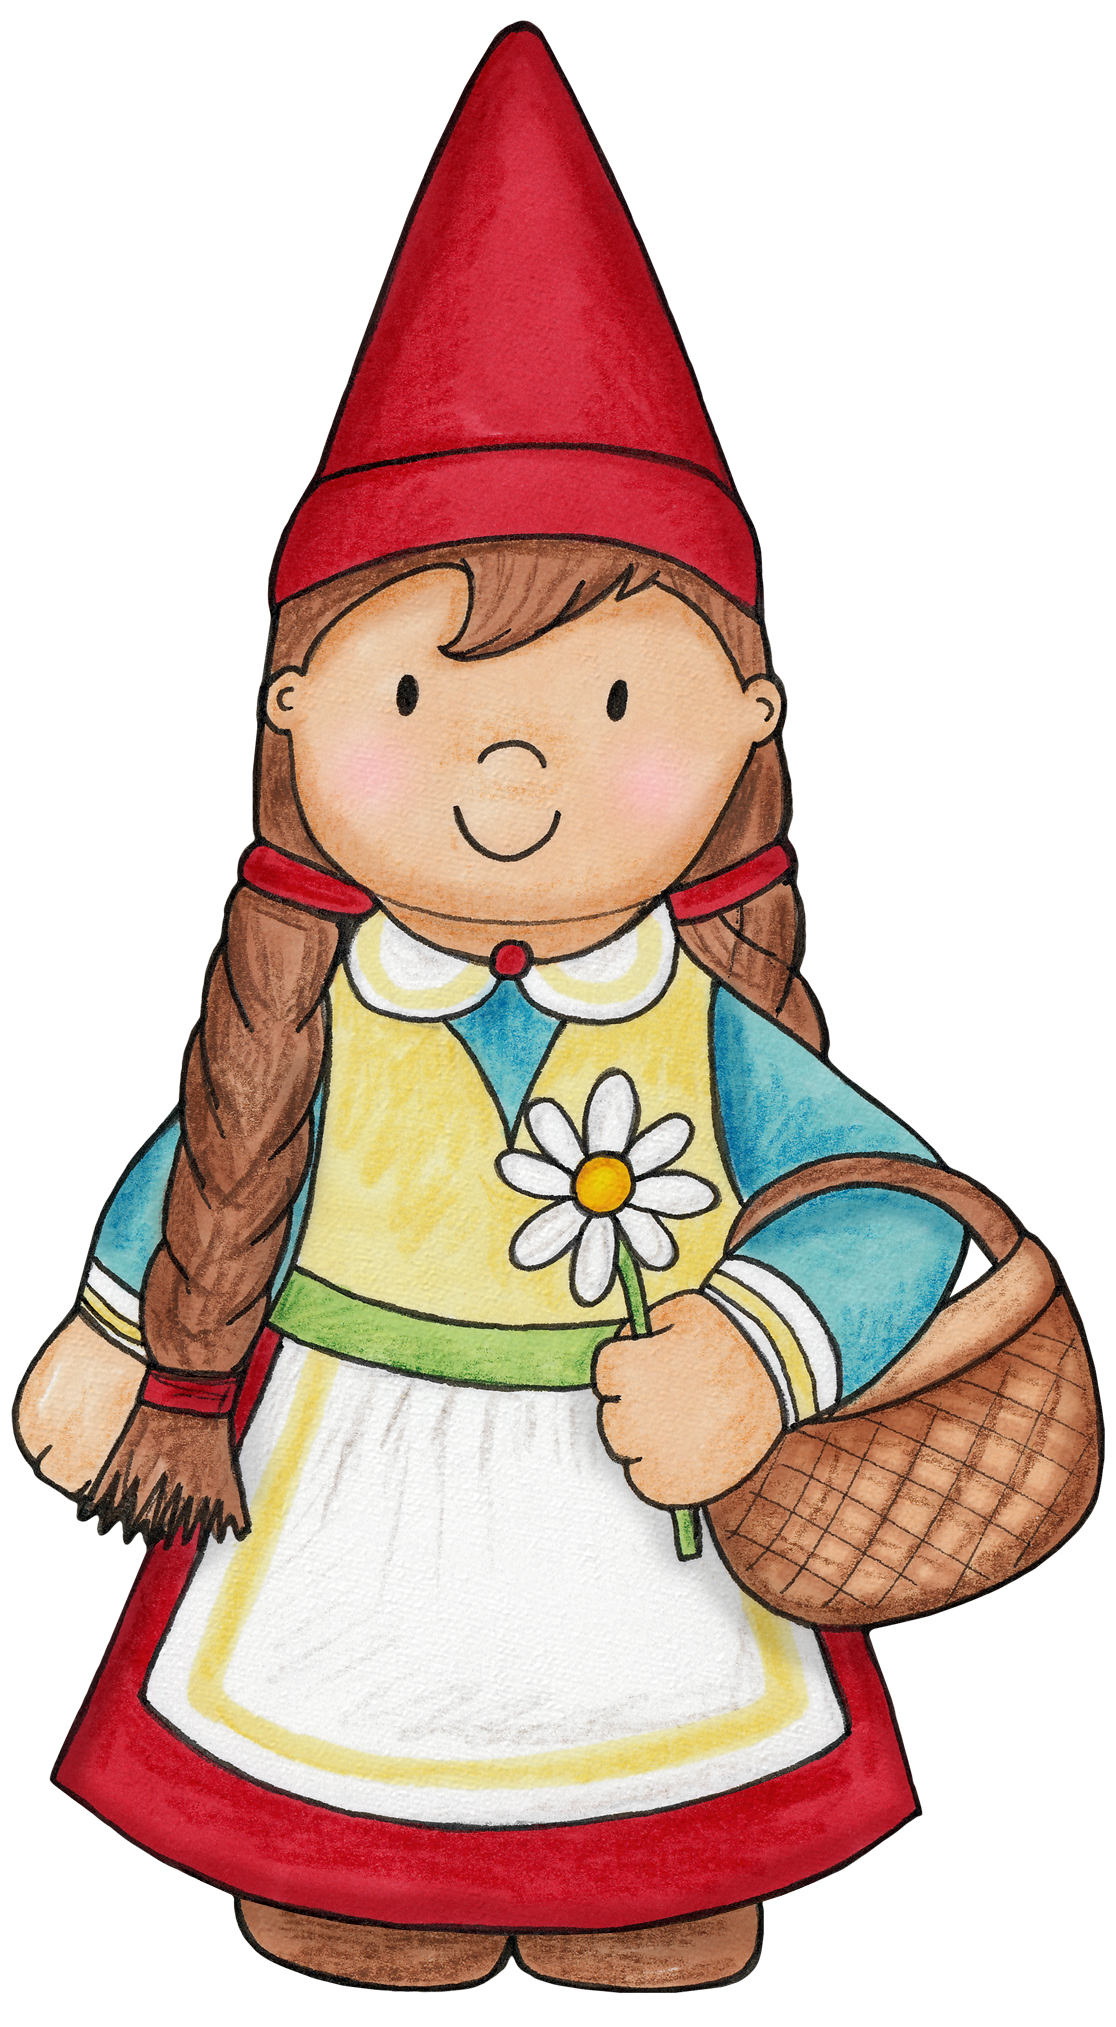 Gardener clipart little girl. Gnome for a woodlands